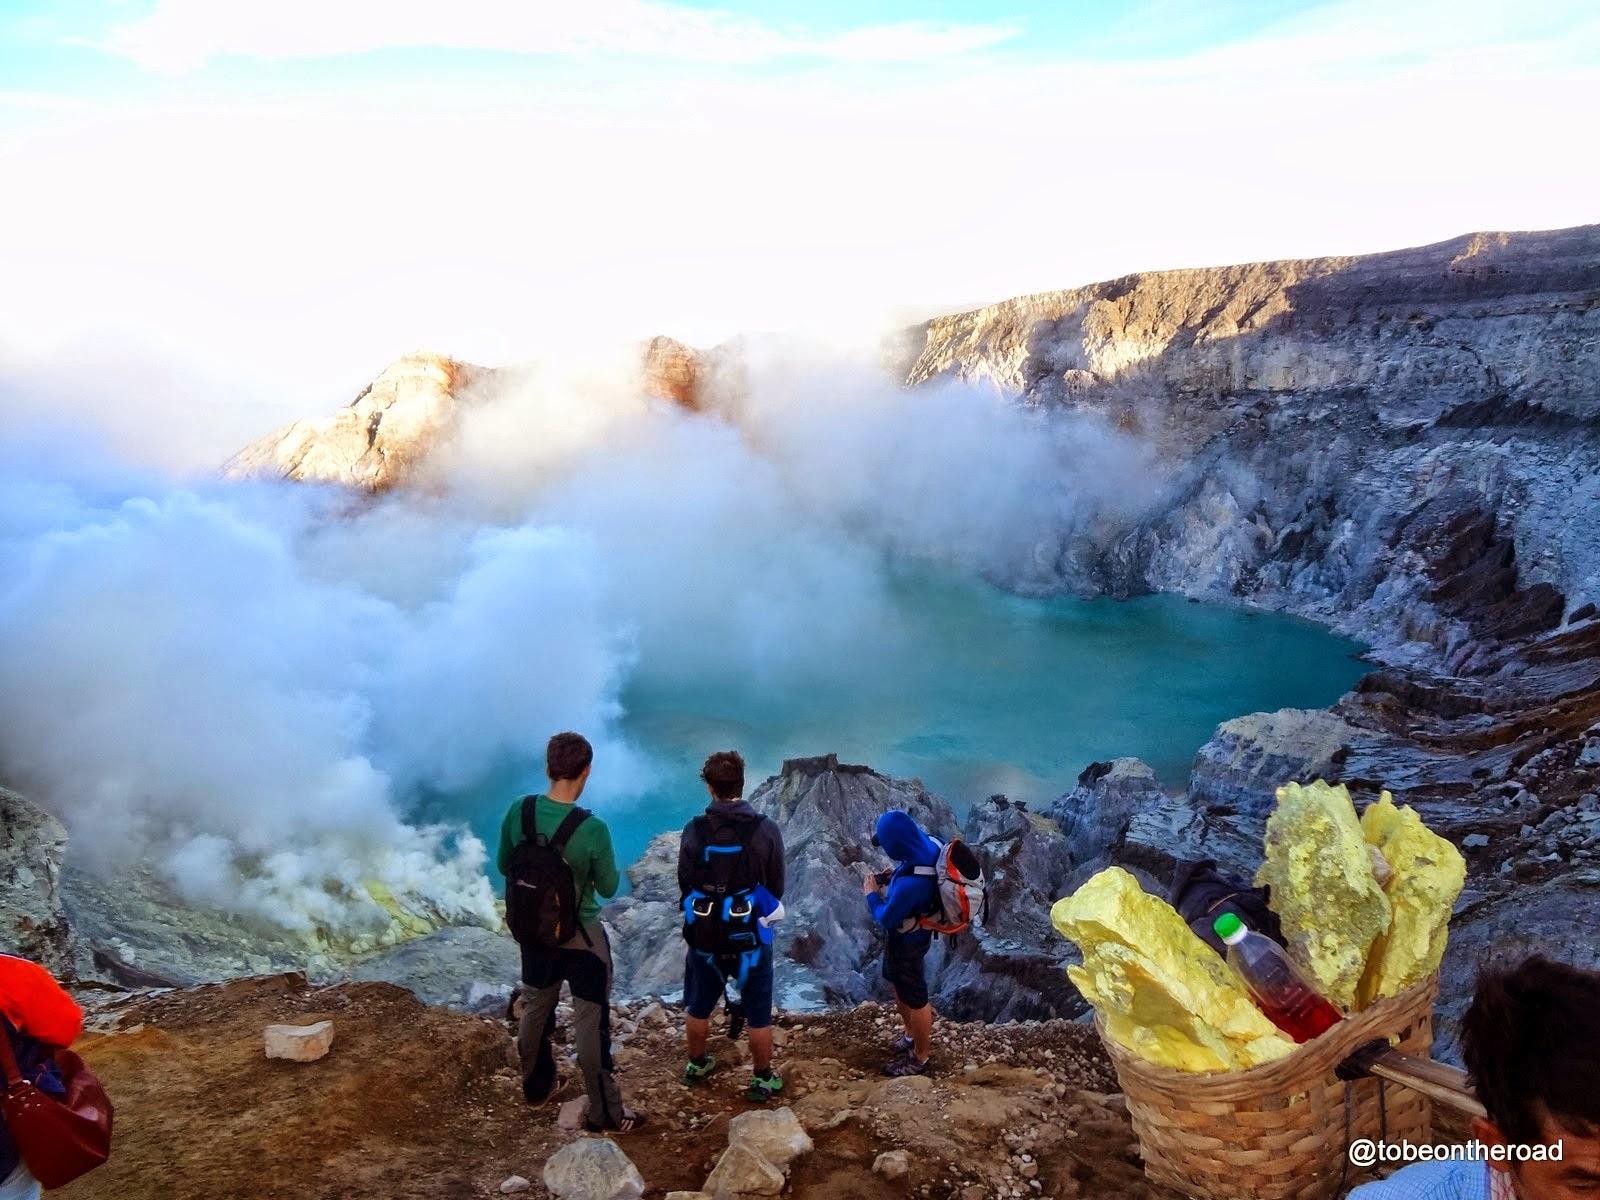 Indonesia,Sulphur,Iljen